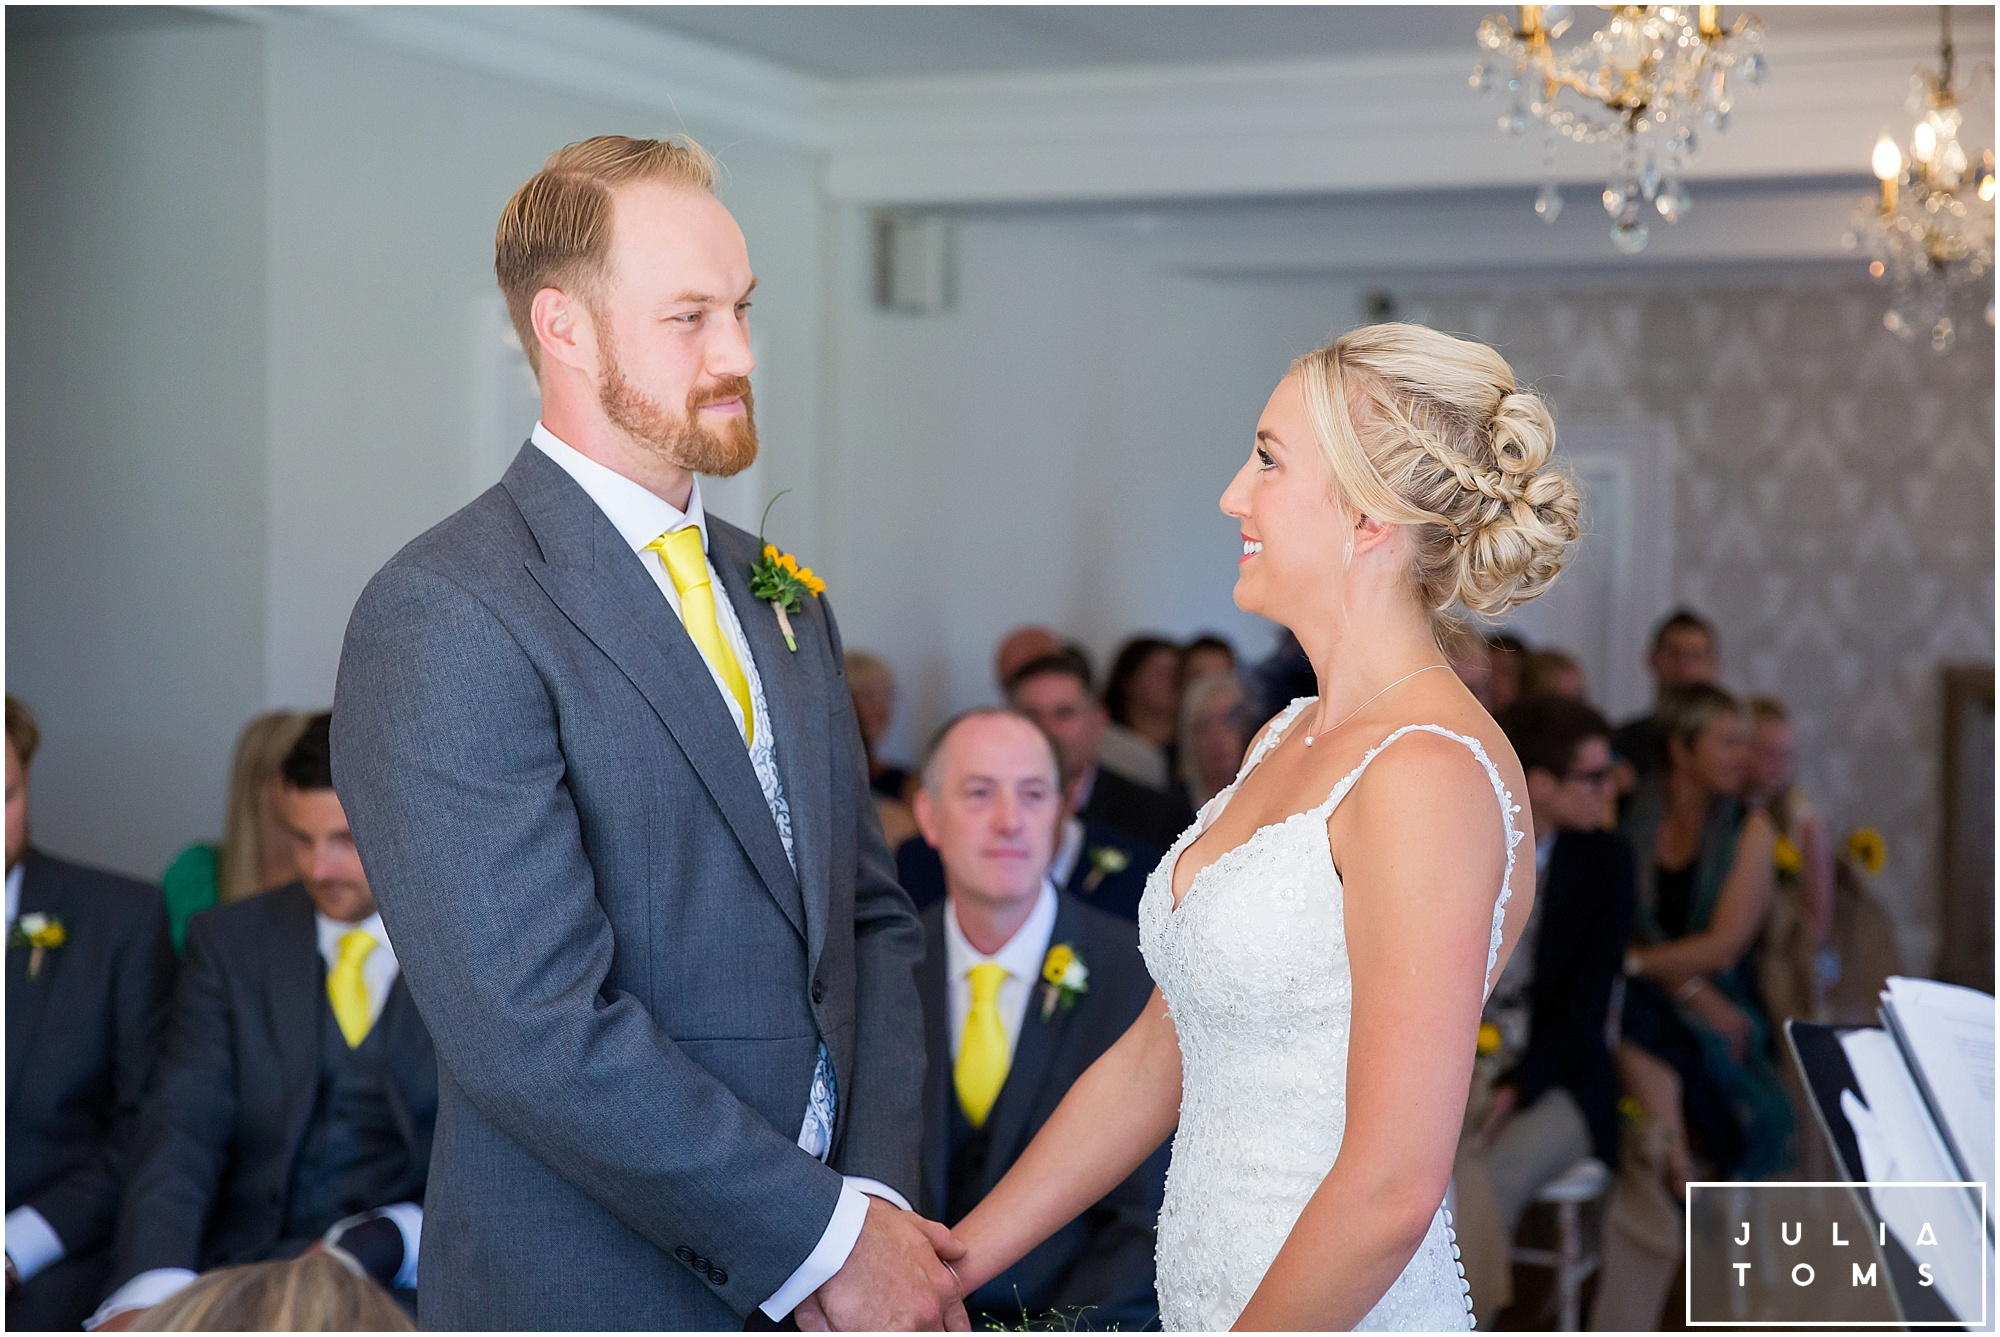 julia_toms_chichester_wedding_photographer_worthing_031.jpg